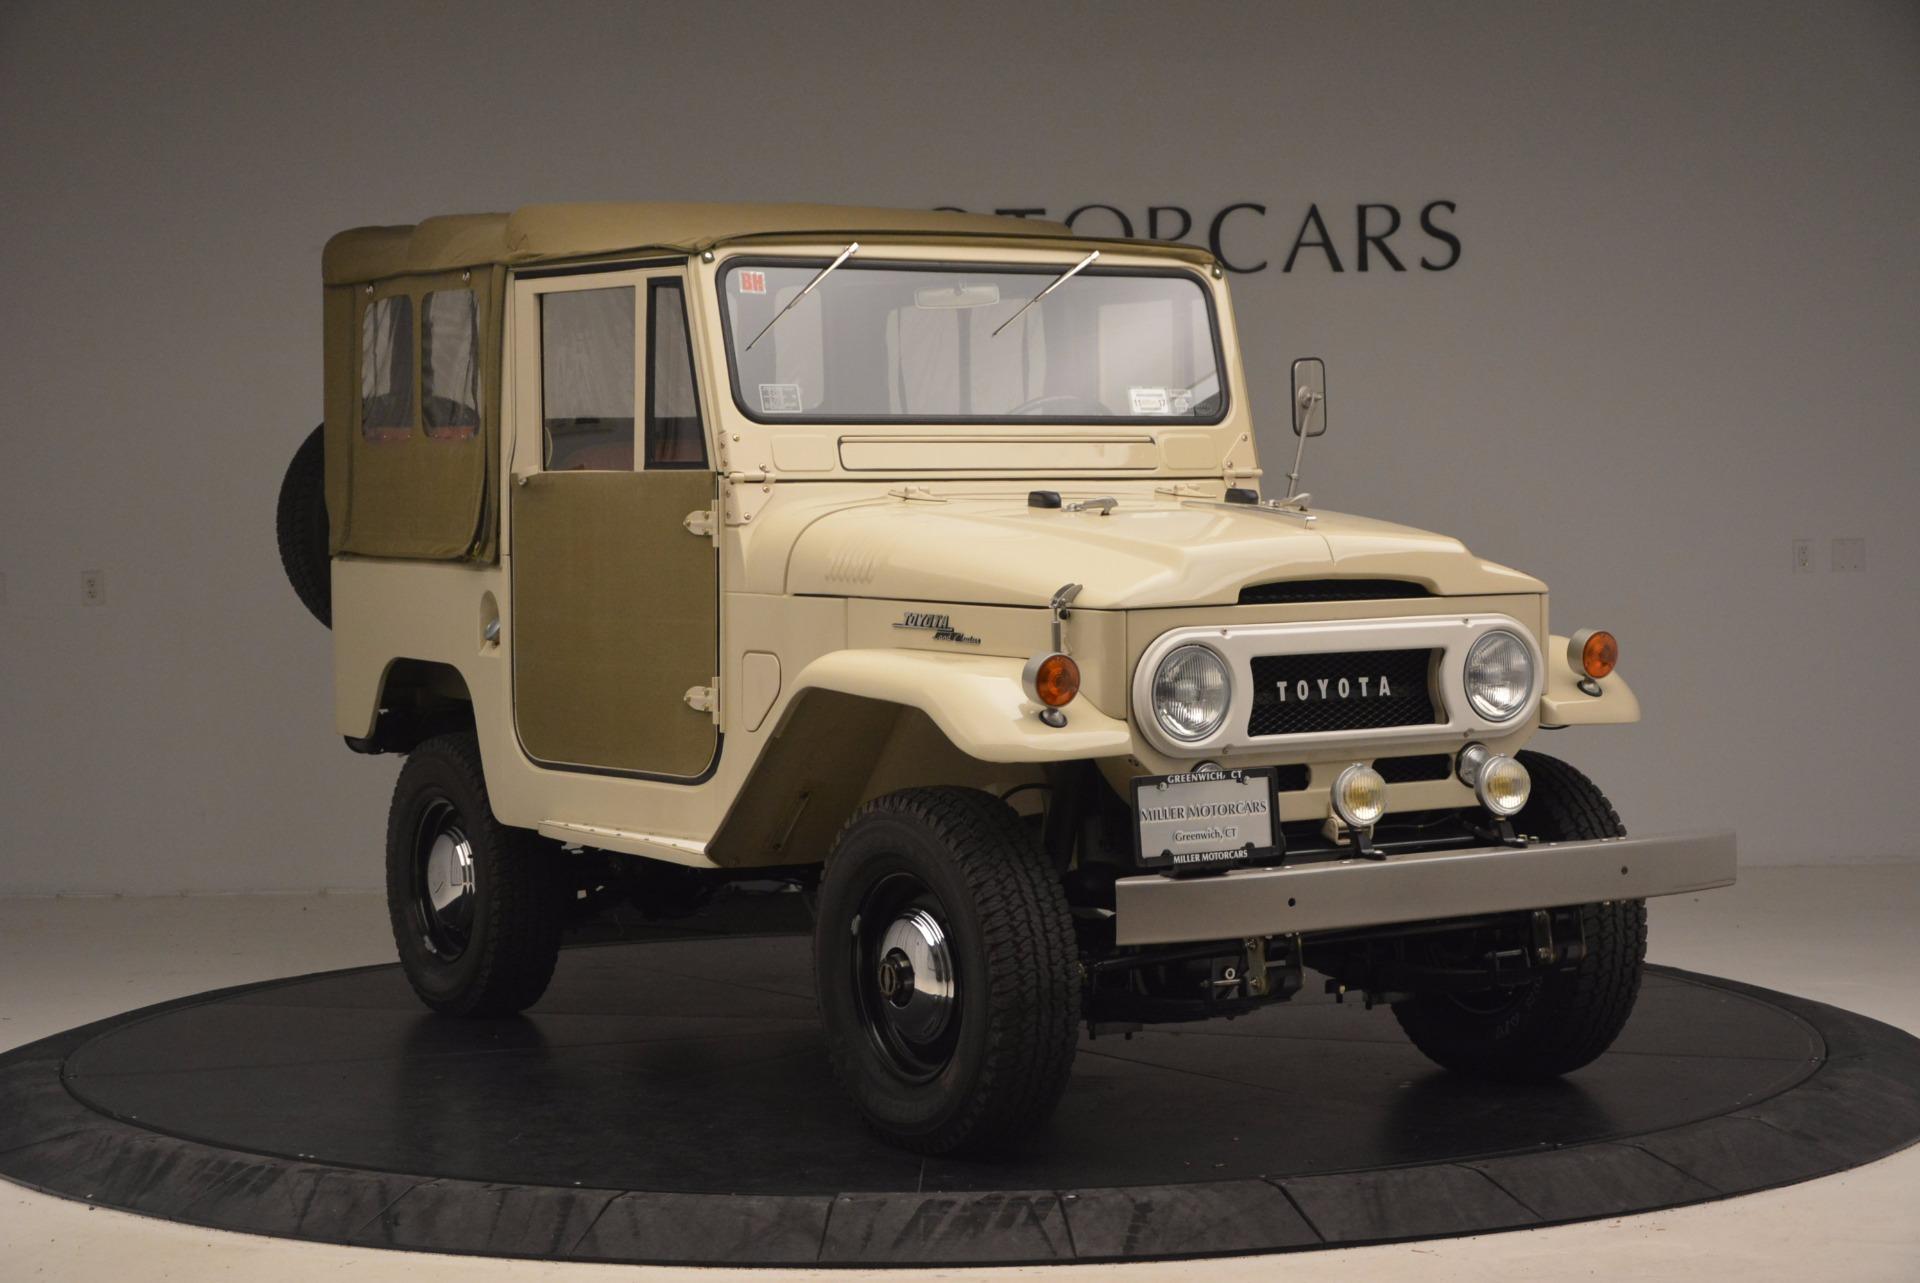 Used 1966 Toyota FJ40 Land Cruiser Land Cruiser